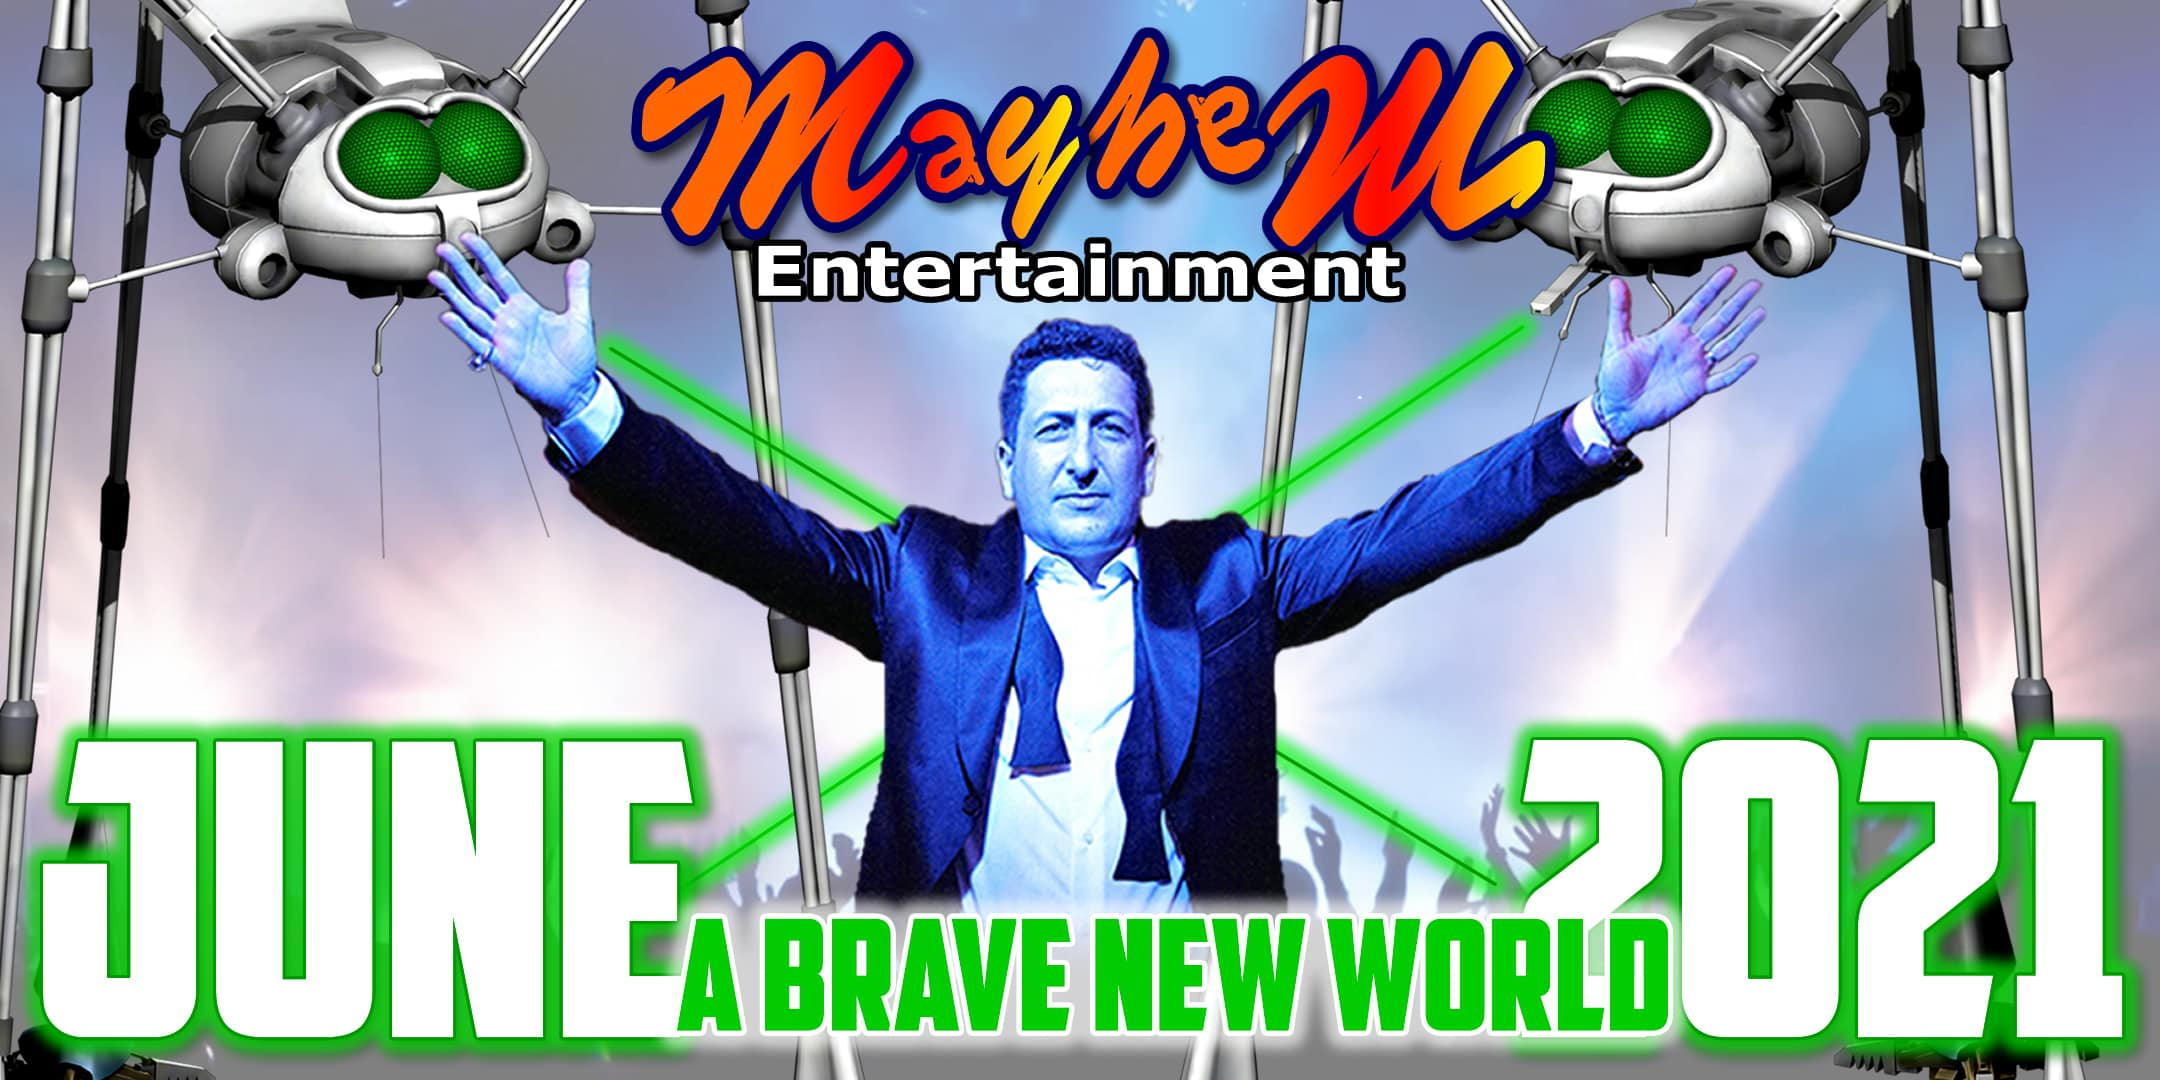 Pete Jackson's Music Show 2021 A Brave New World